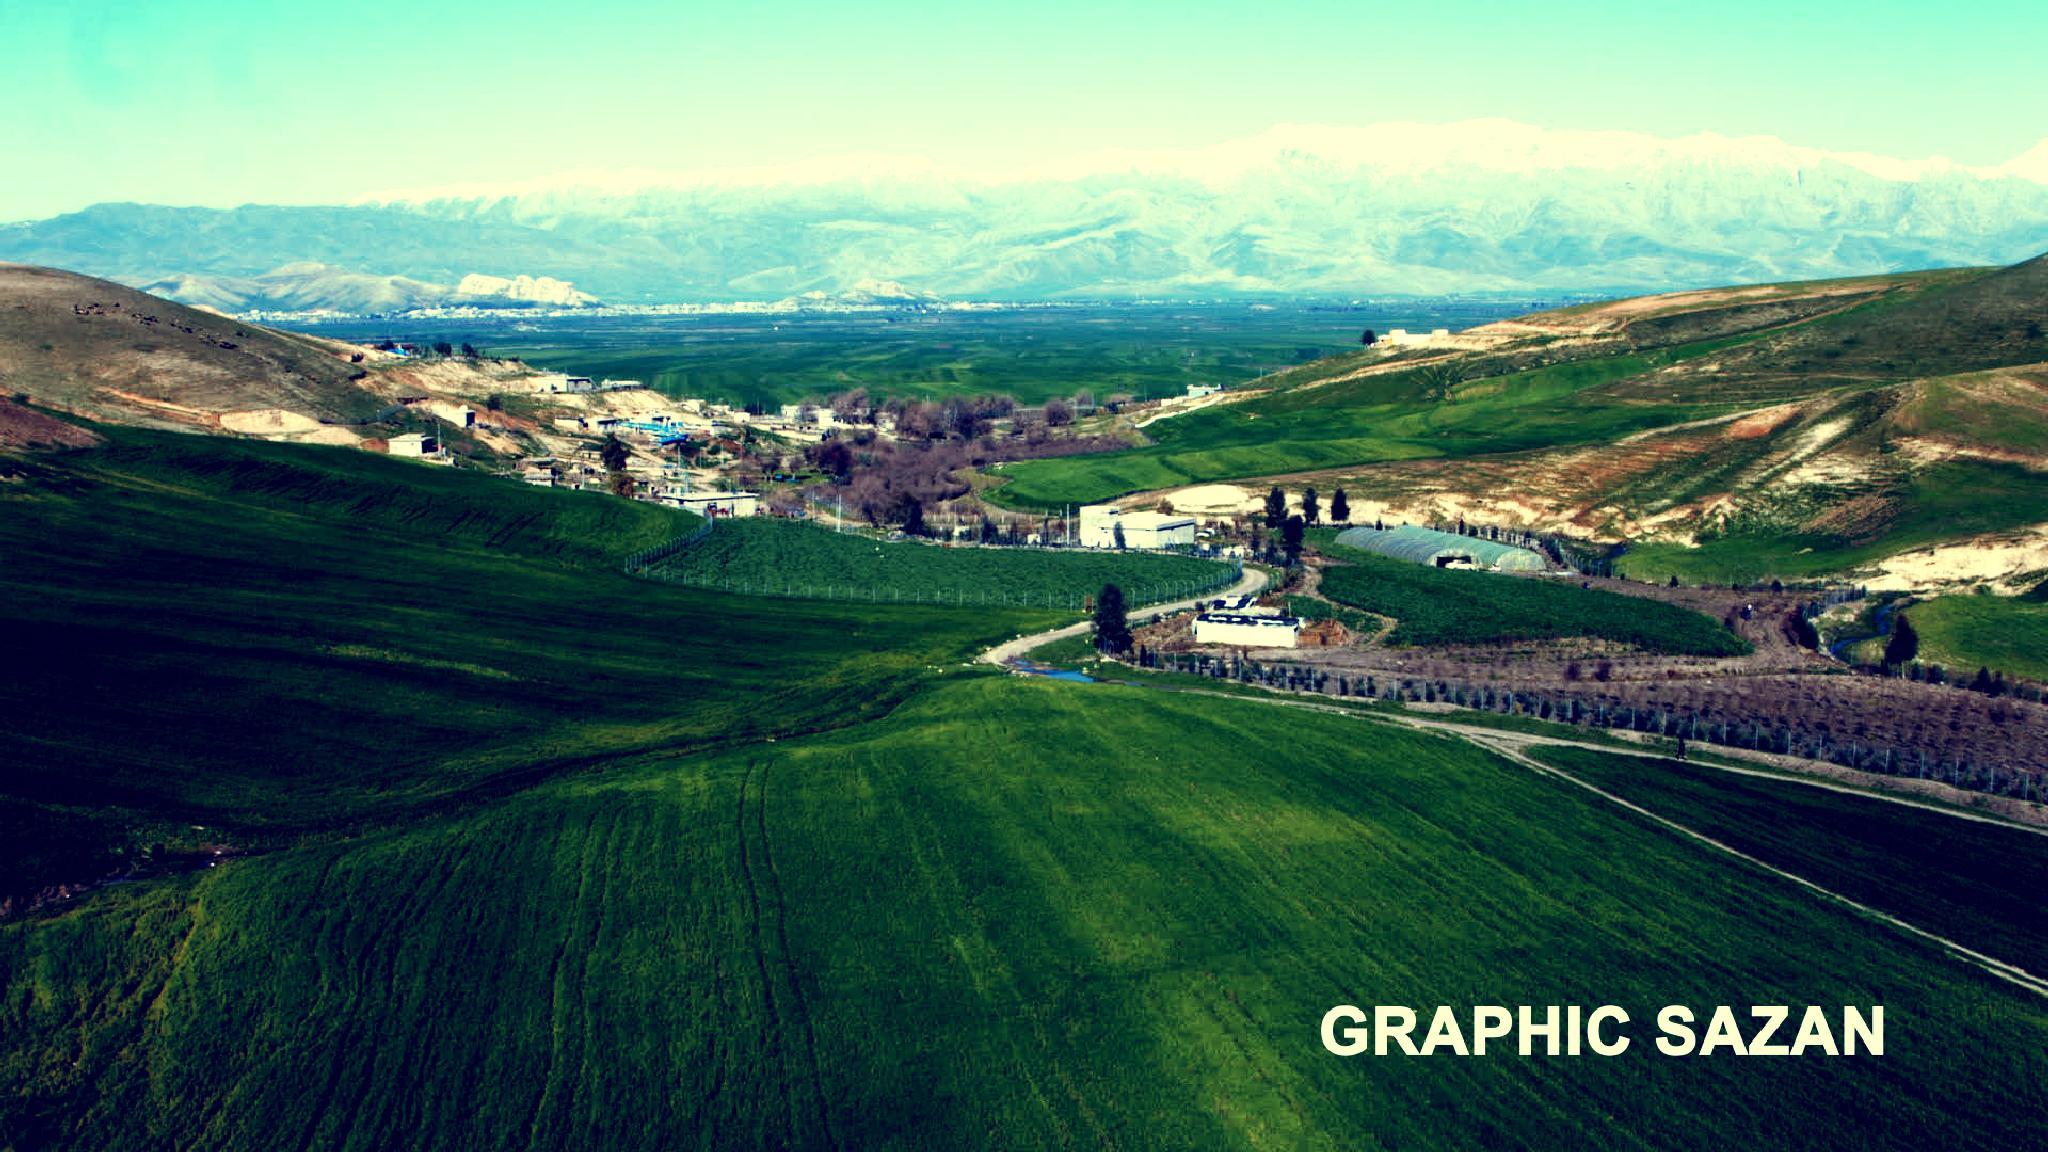 kurdistan by graphicsazan